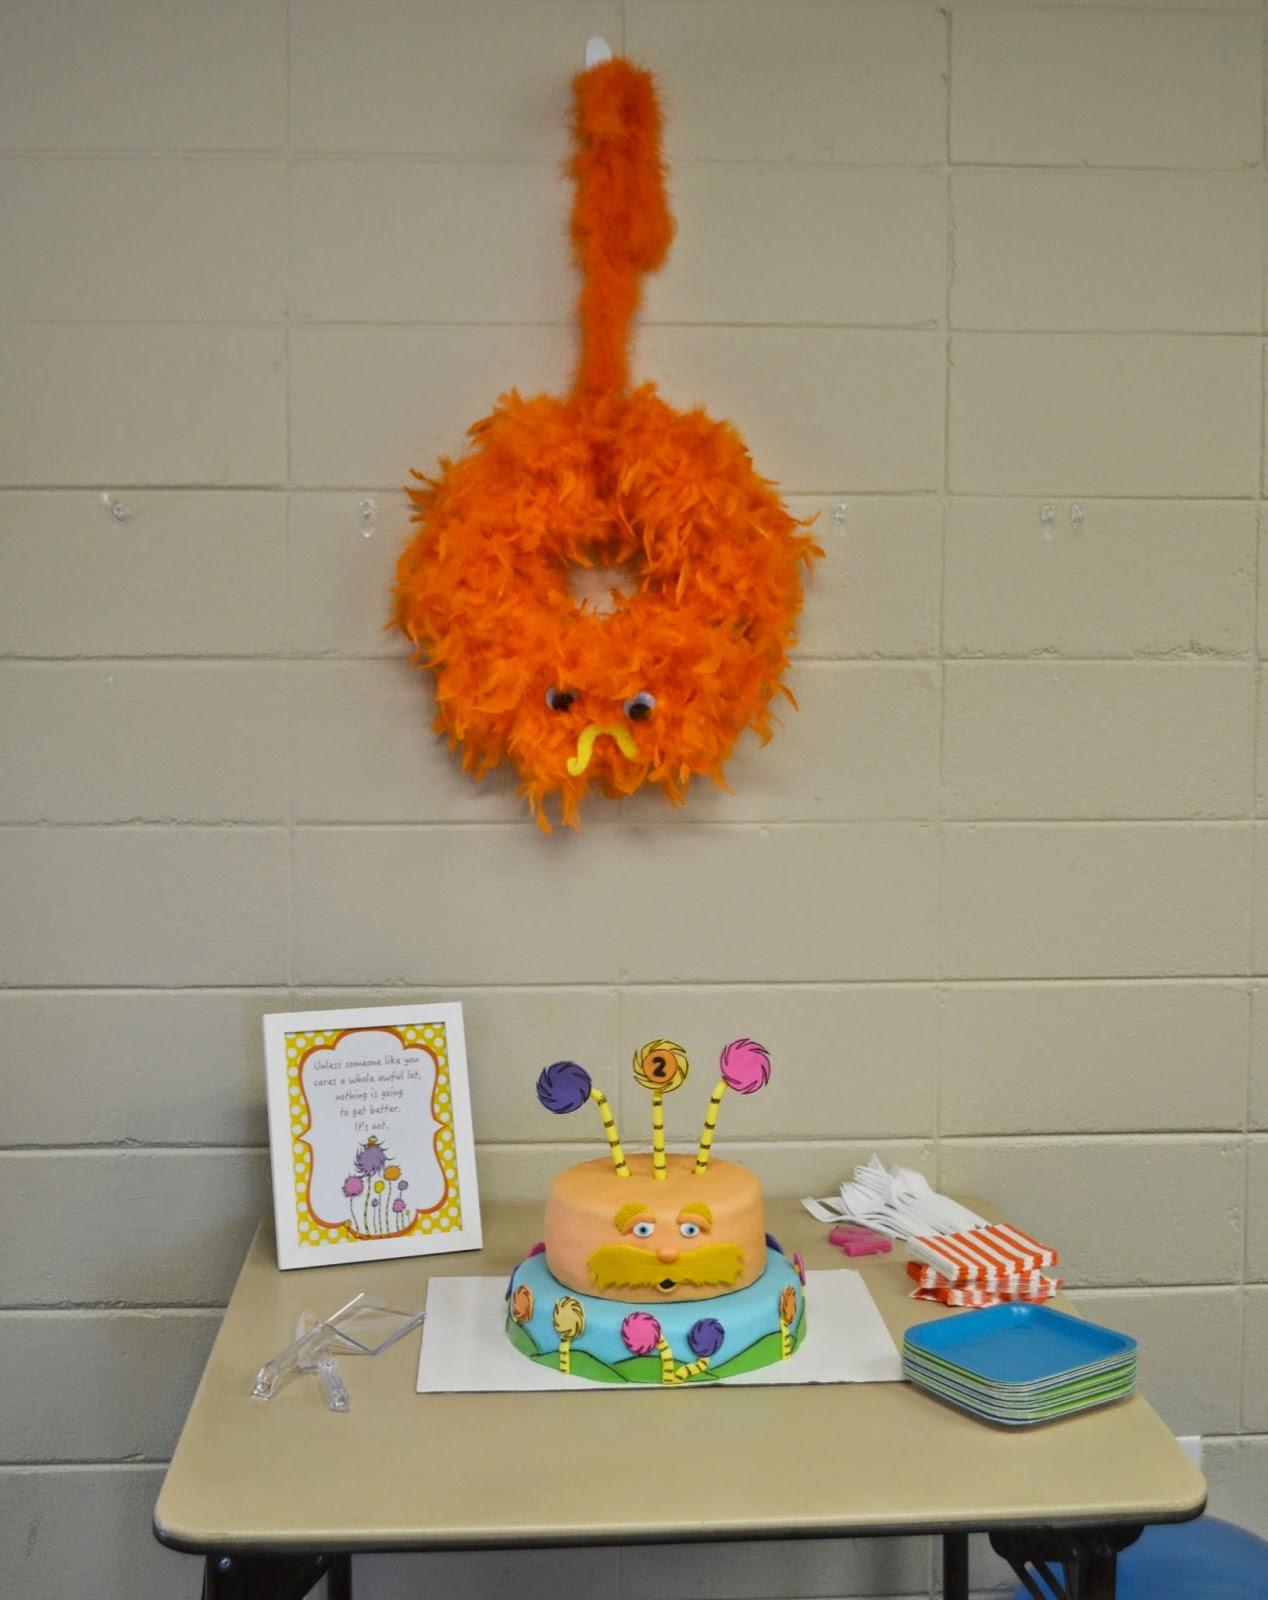 The Lorax Wreath #DIY. Lorax Wreath.  The Lorax Birthday Party.  Lorax Birthday party.  The Lorax Birthday Party ideas.  Lorax party decorations.  Lorax birthday decorations.